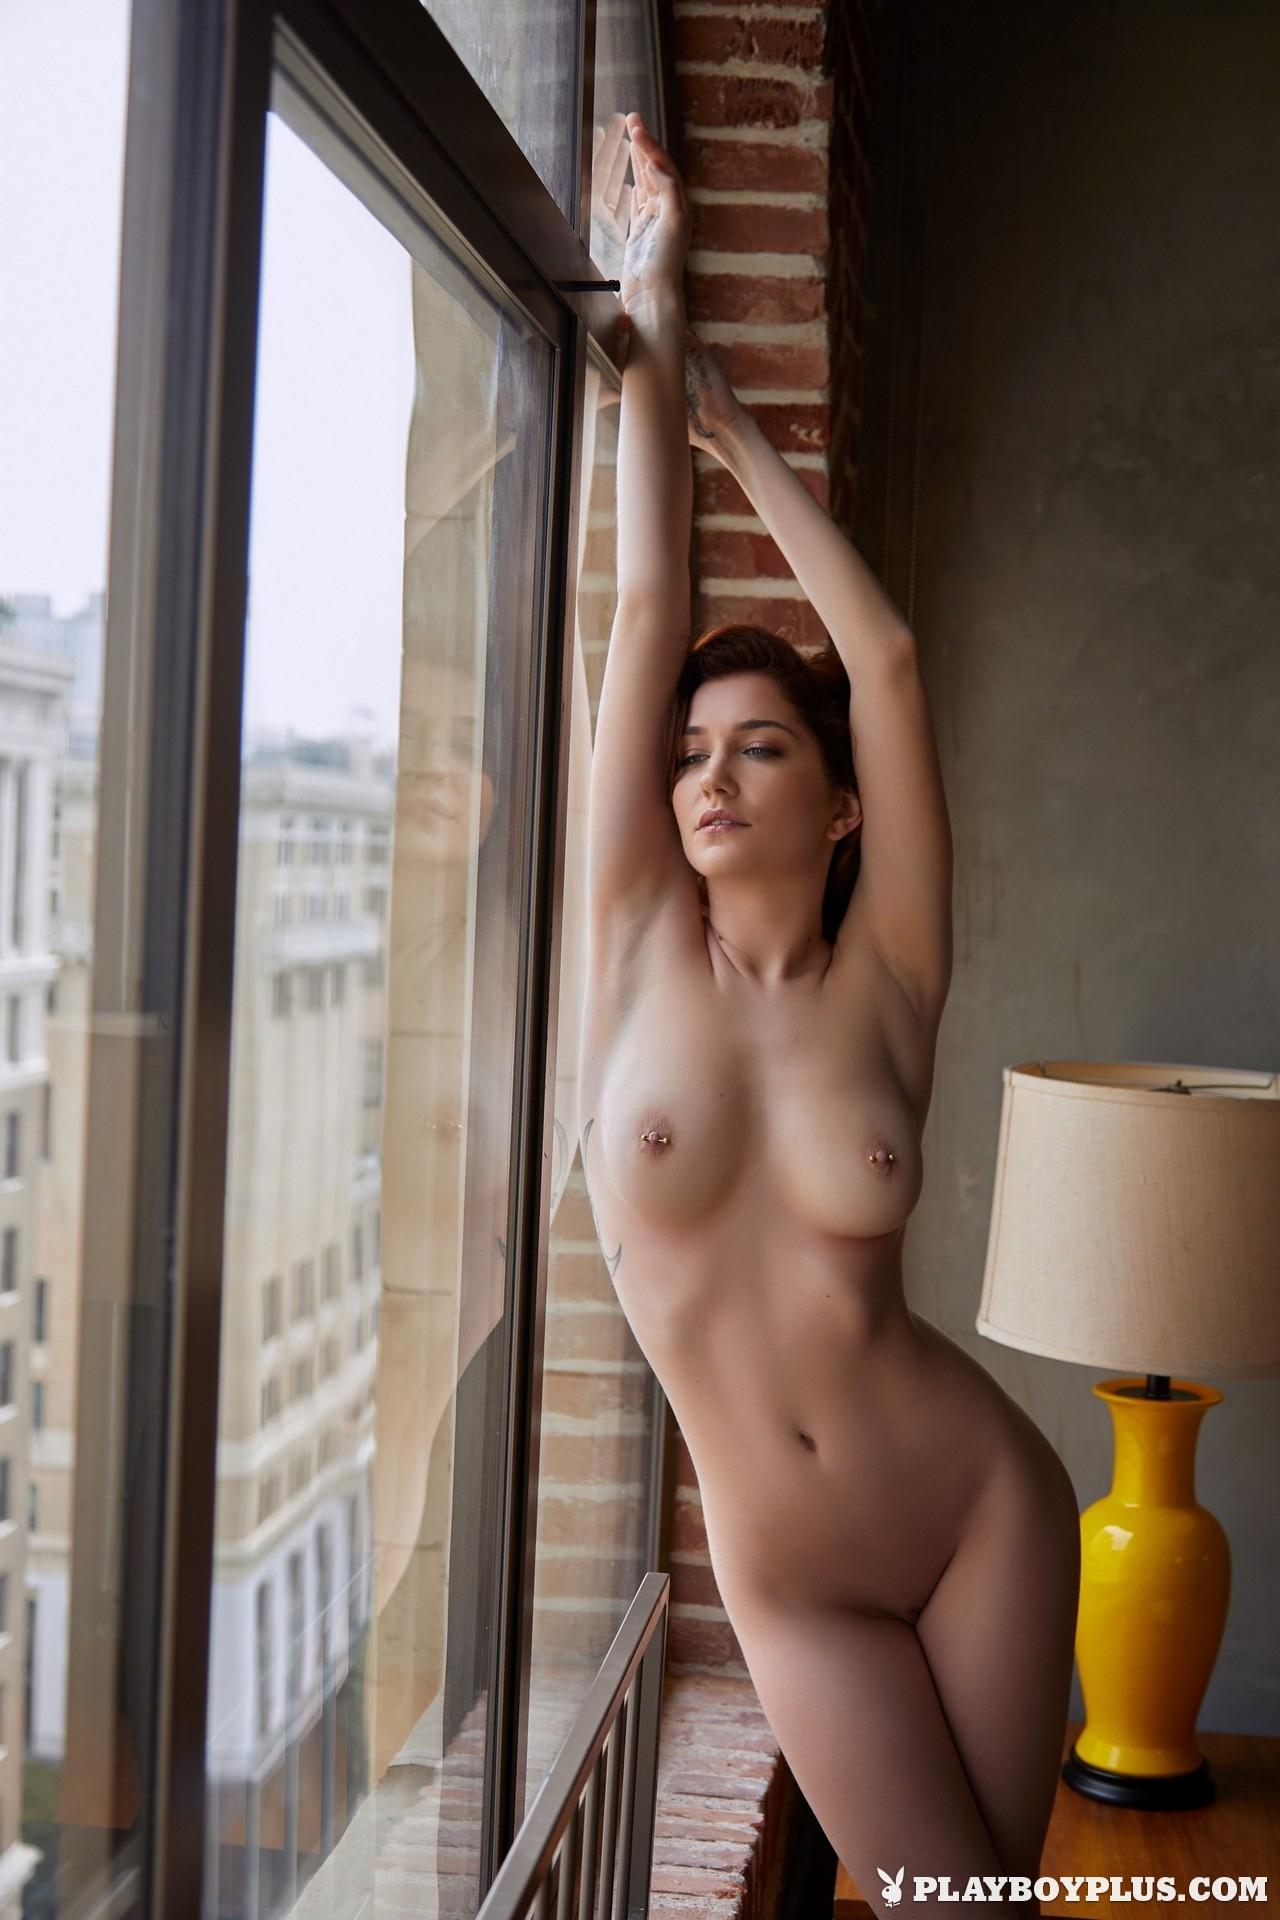 Skye Blue In Casual Chic Playboy Plus (30)